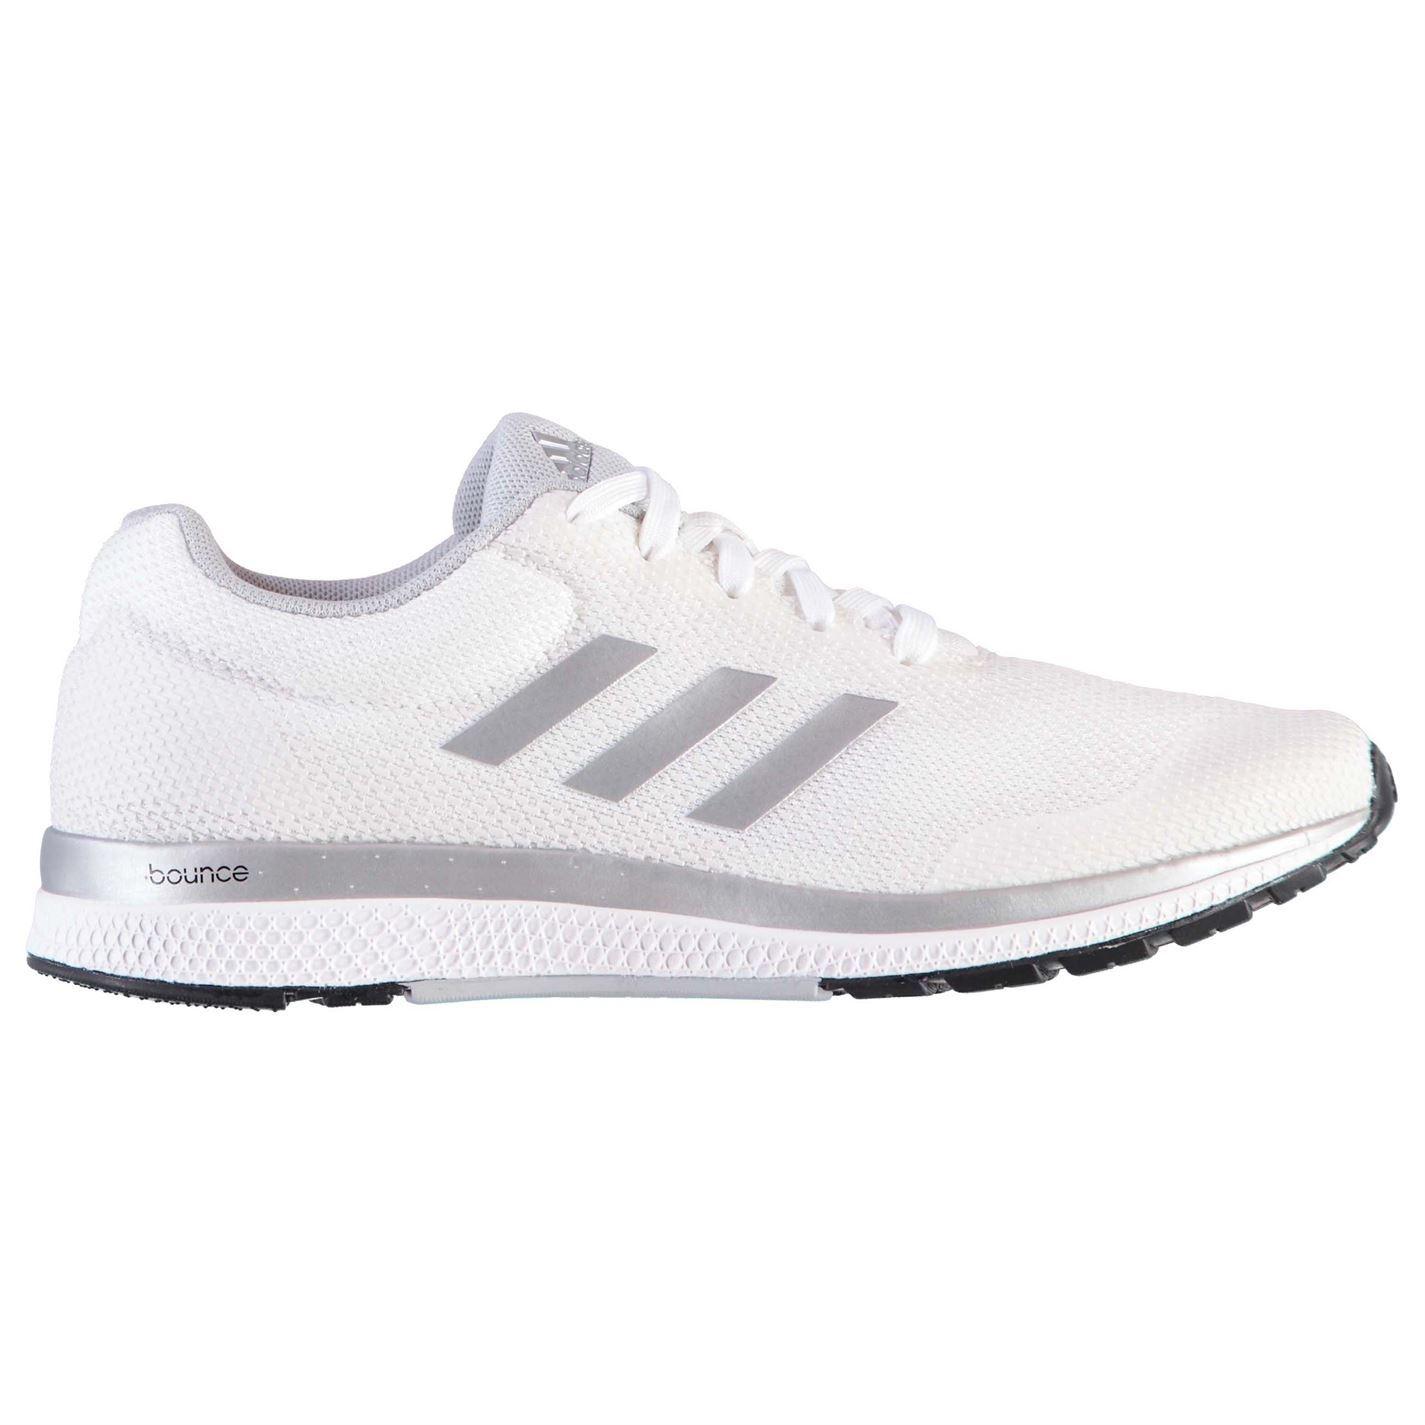 5cd917e379740 adidas Womens Mana Bounce 2 Running Shoes Cross Training Sports ...